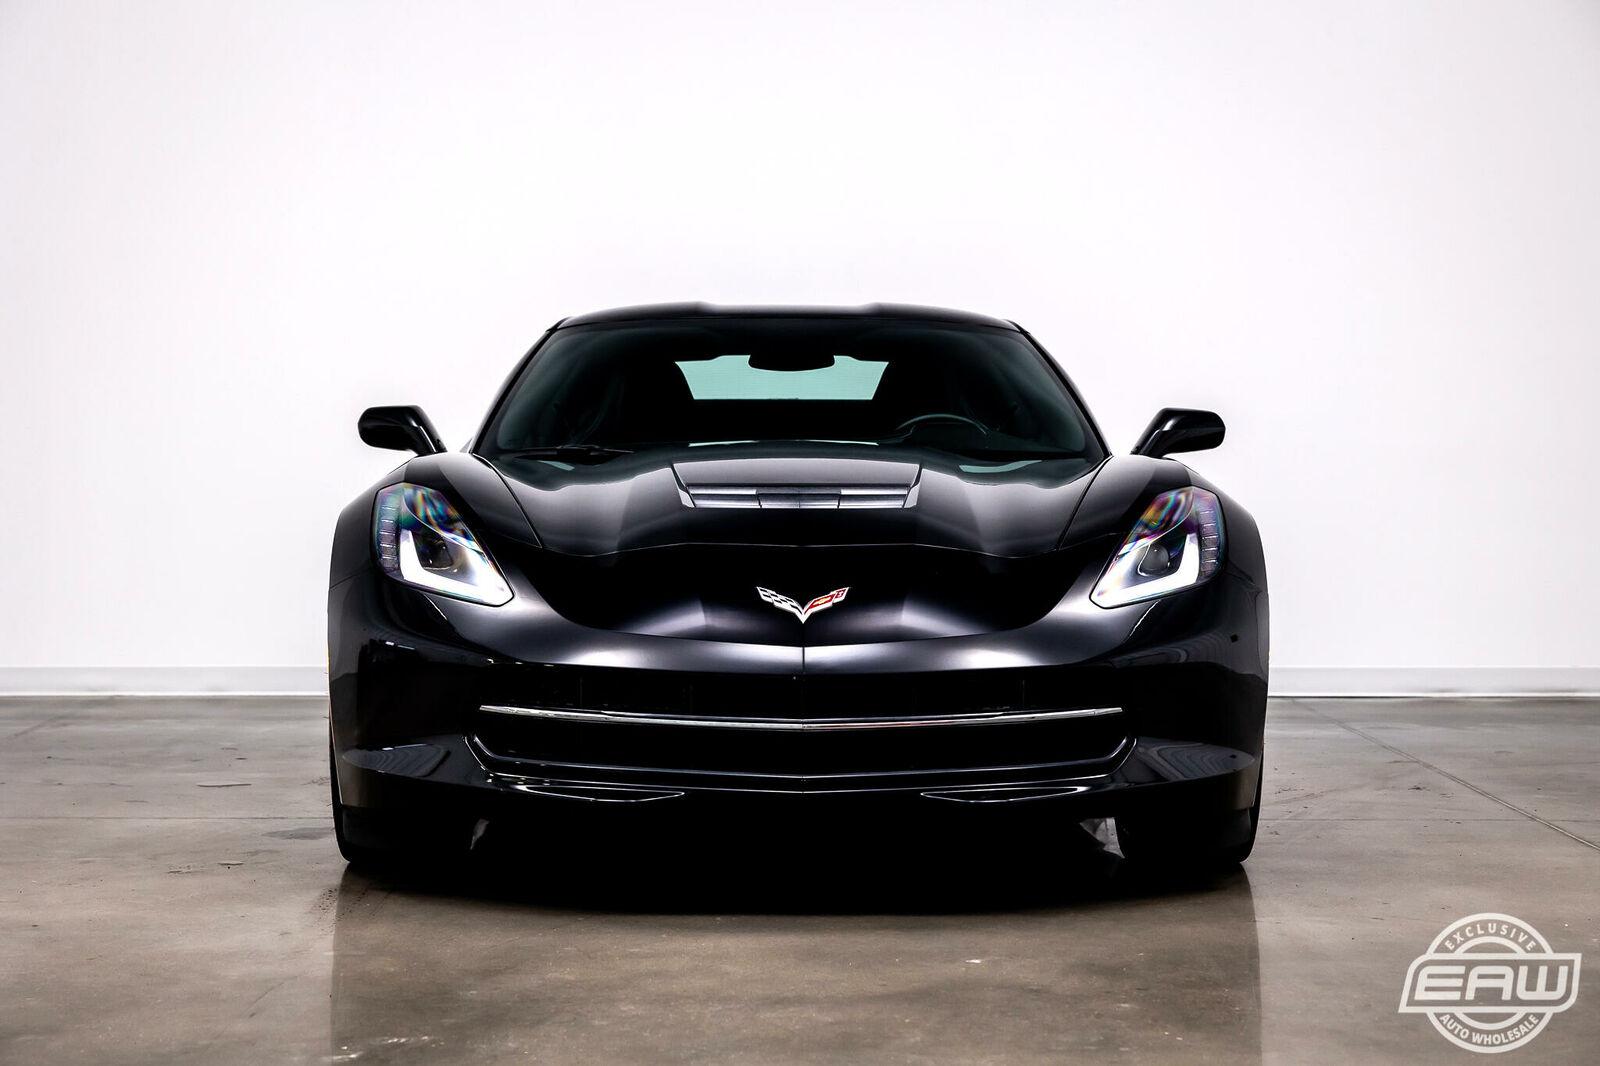 2014 Black Chevrolet Corvette Coupe 1LT | C7 Corvette Photo 3